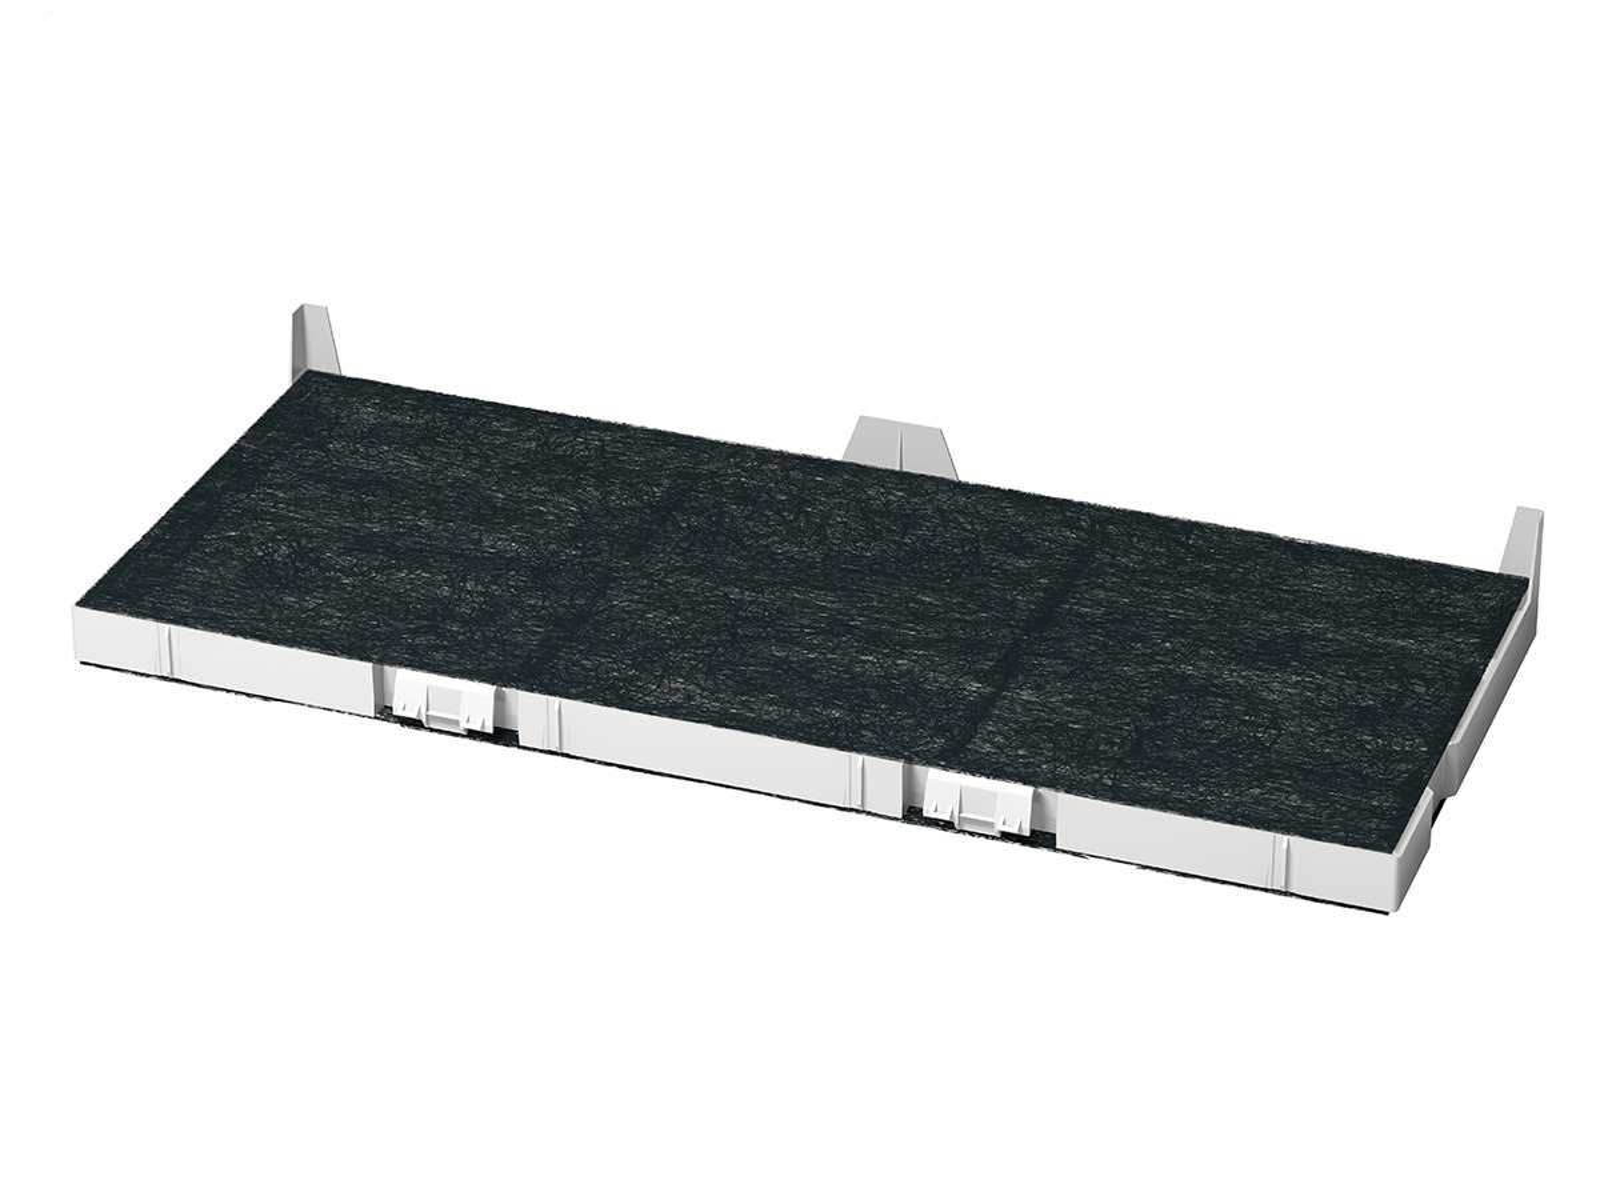 siemens lz45610 aktivfilter f r umluftbetrieb. Black Bedroom Furniture Sets. Home Design Ideas